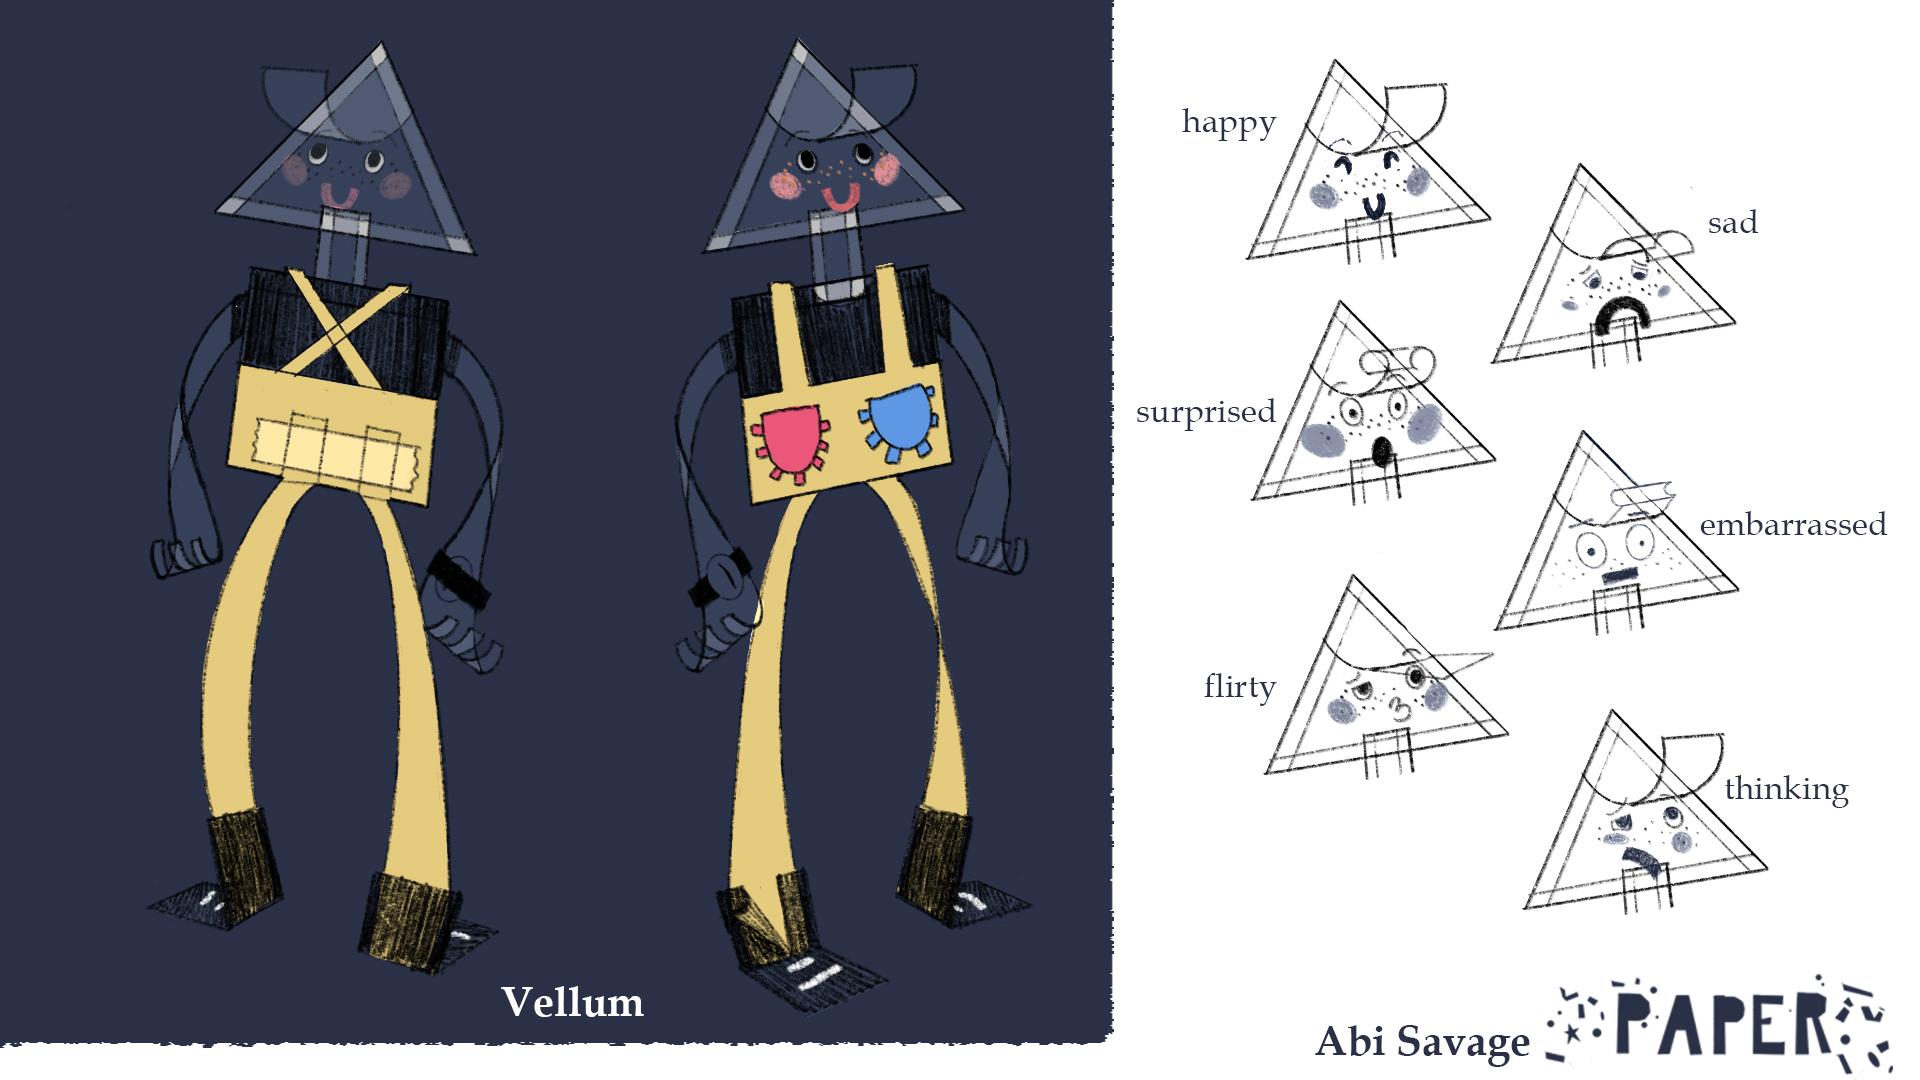 Vellum Turnaround and Expression Sheet